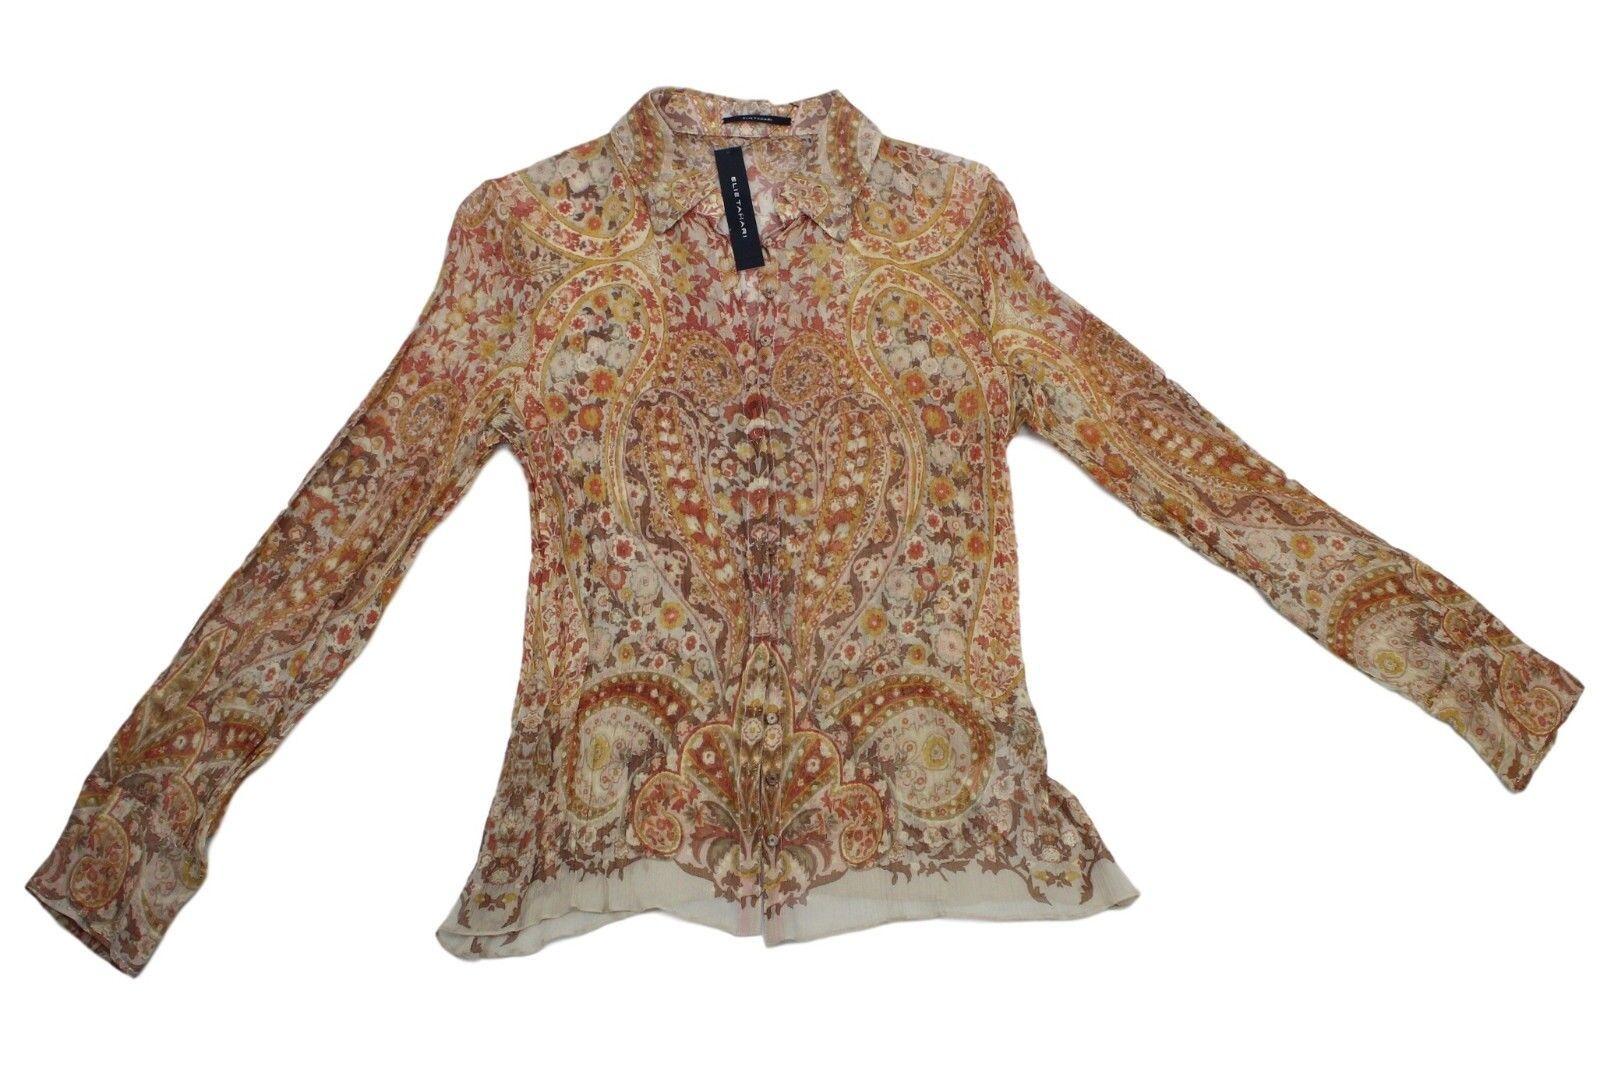 Camisa para mujer Ellie Tahari Trébol-Arenisca 100% Seda azulsa  SNAP delantera, M  buscando agente de ventas